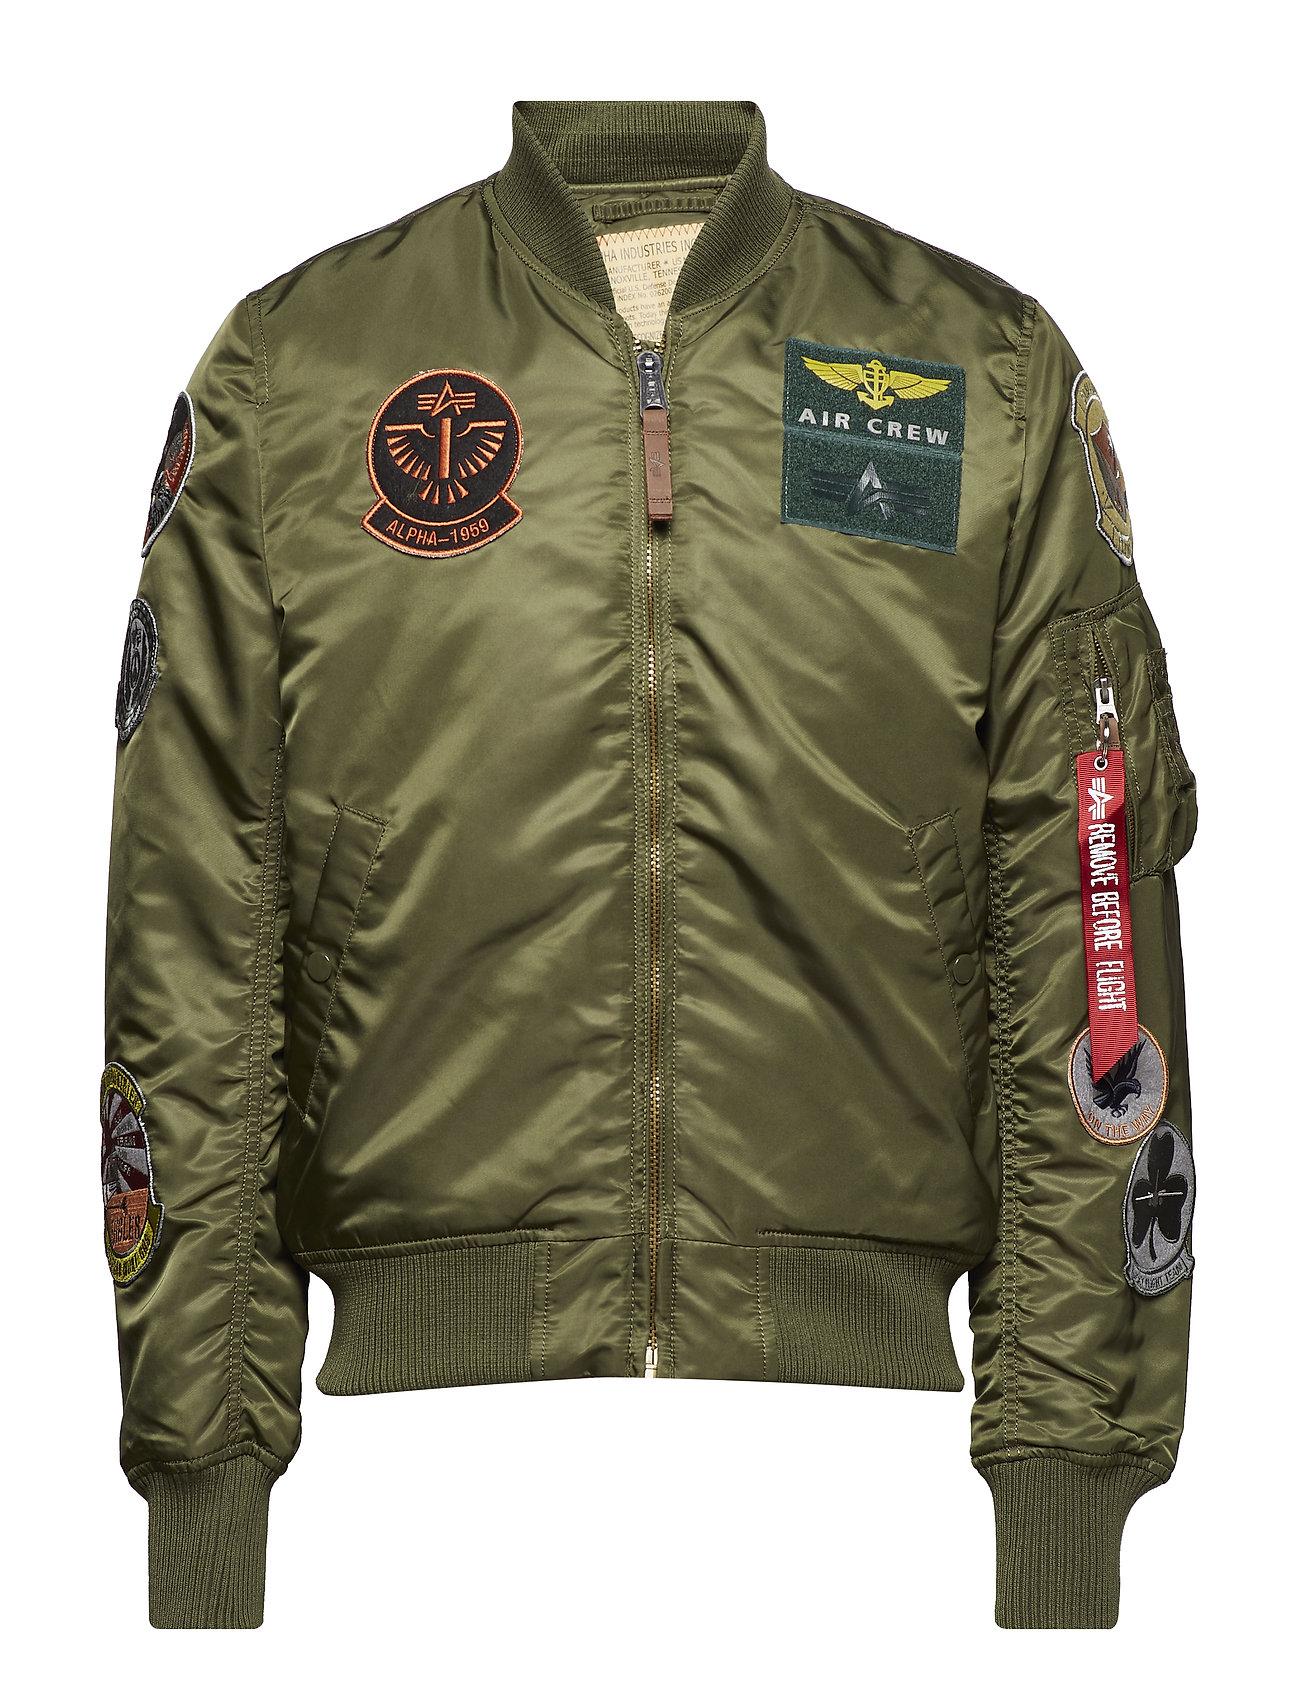 MA 1 pilotjakke i grøn